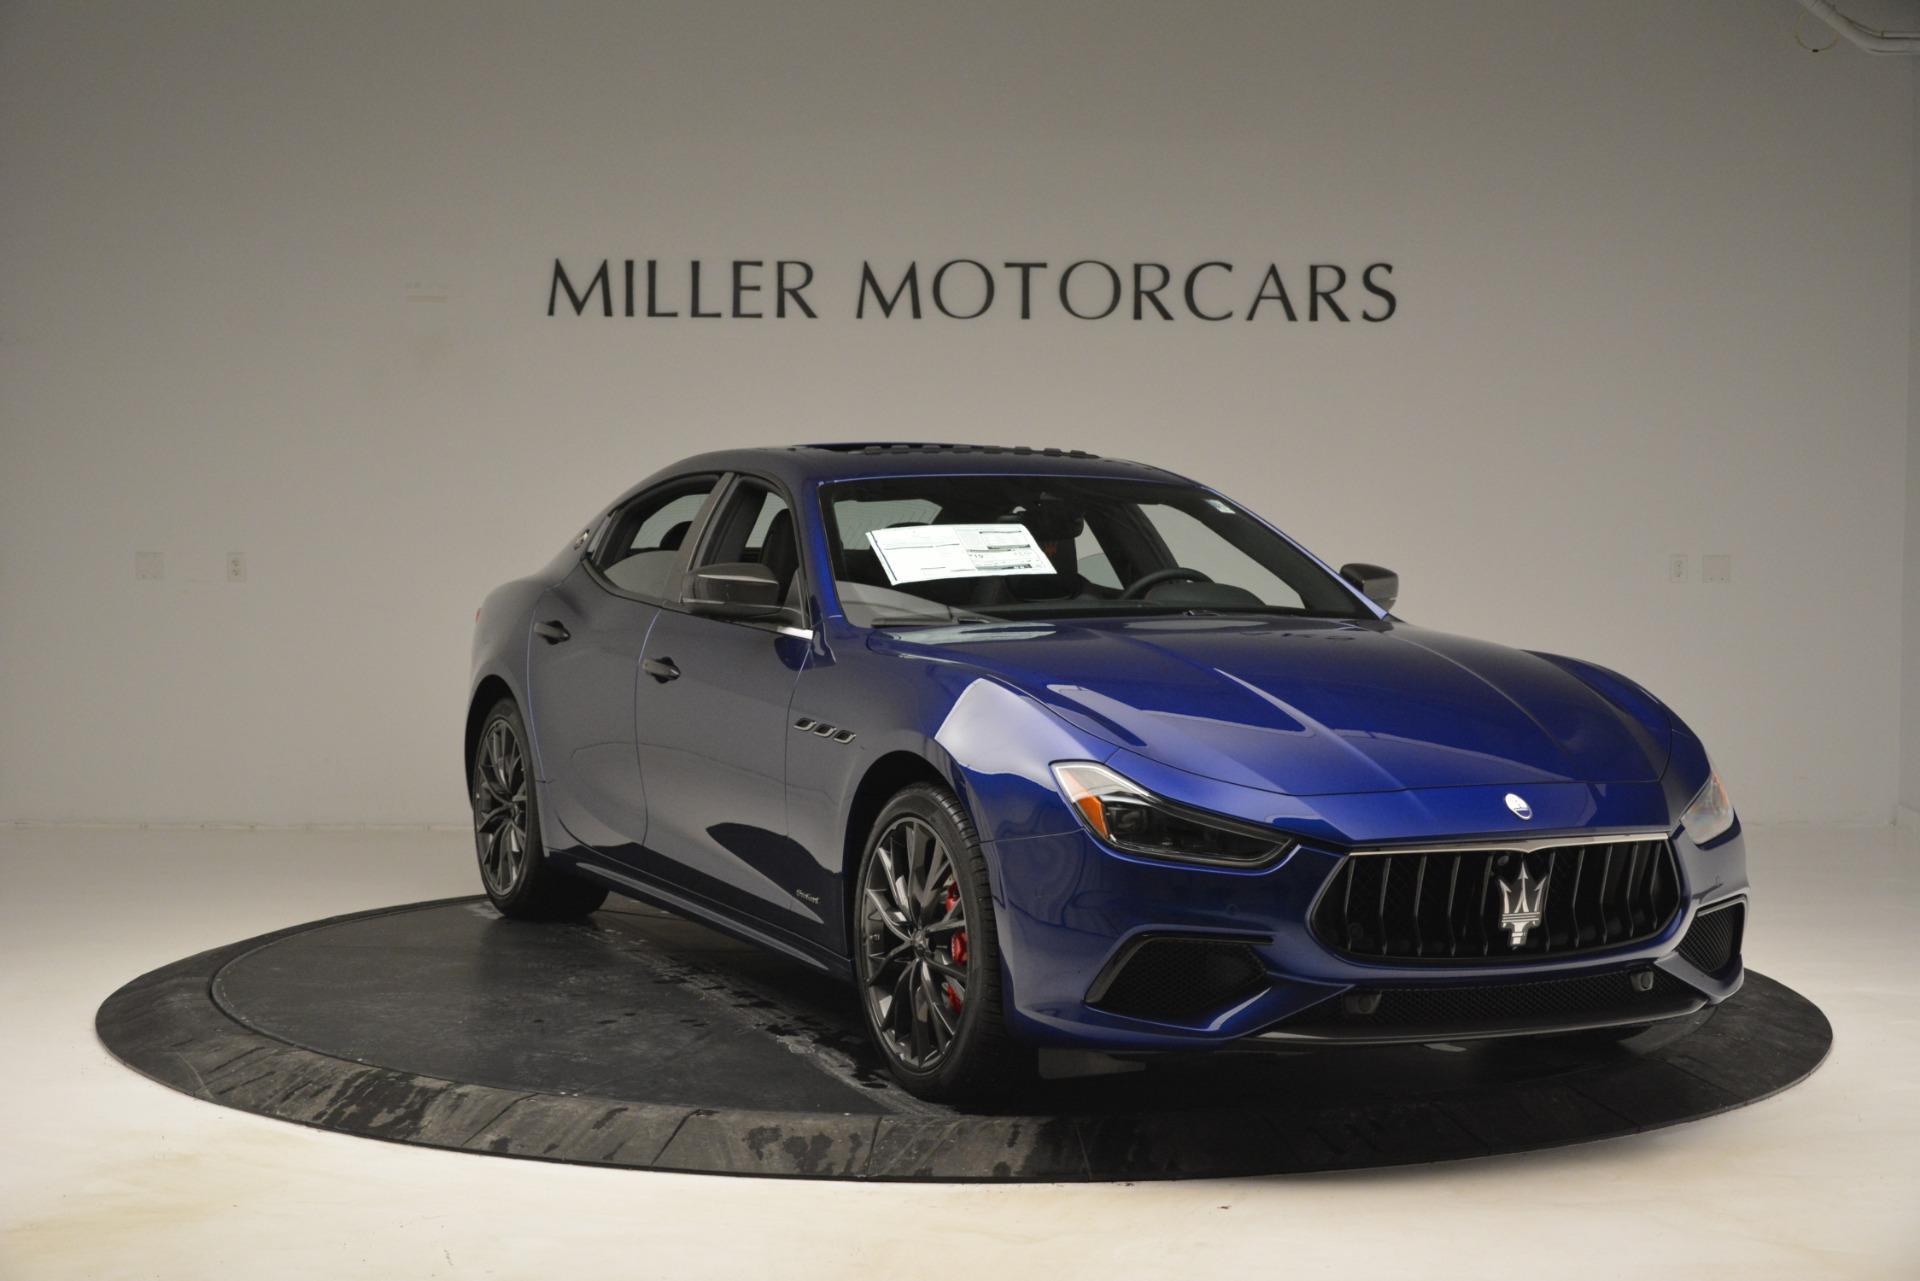 New 2019 Maserati Ghibli S Q4 GranSport For Sale In Greenwich, CT 2928_p11